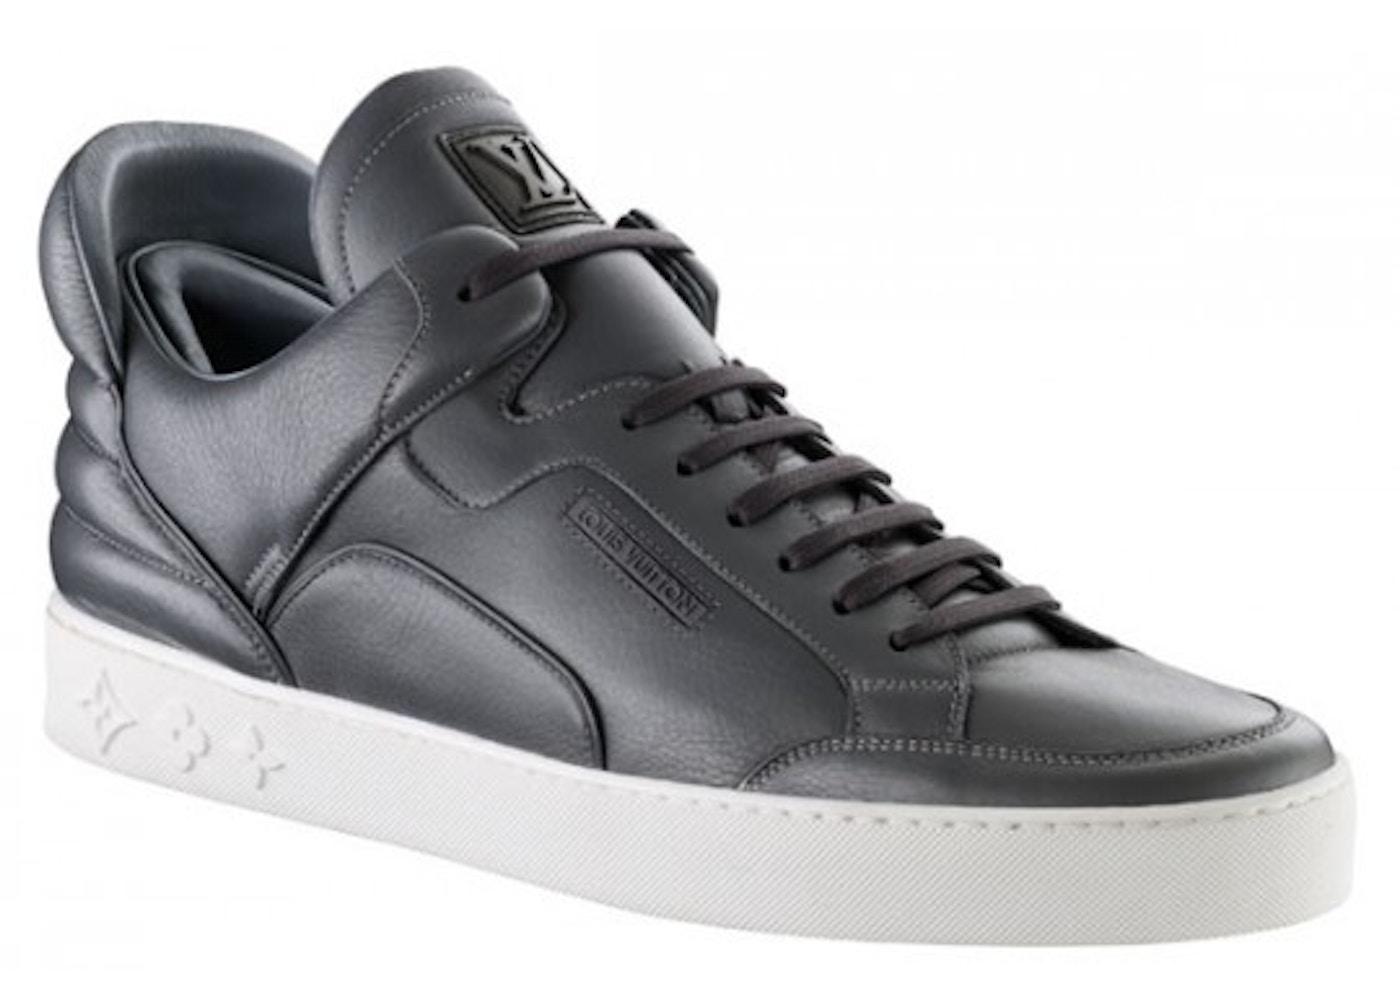 56854e4780a Buy Louis Vuitton Shoes   Deadstock Sneakers